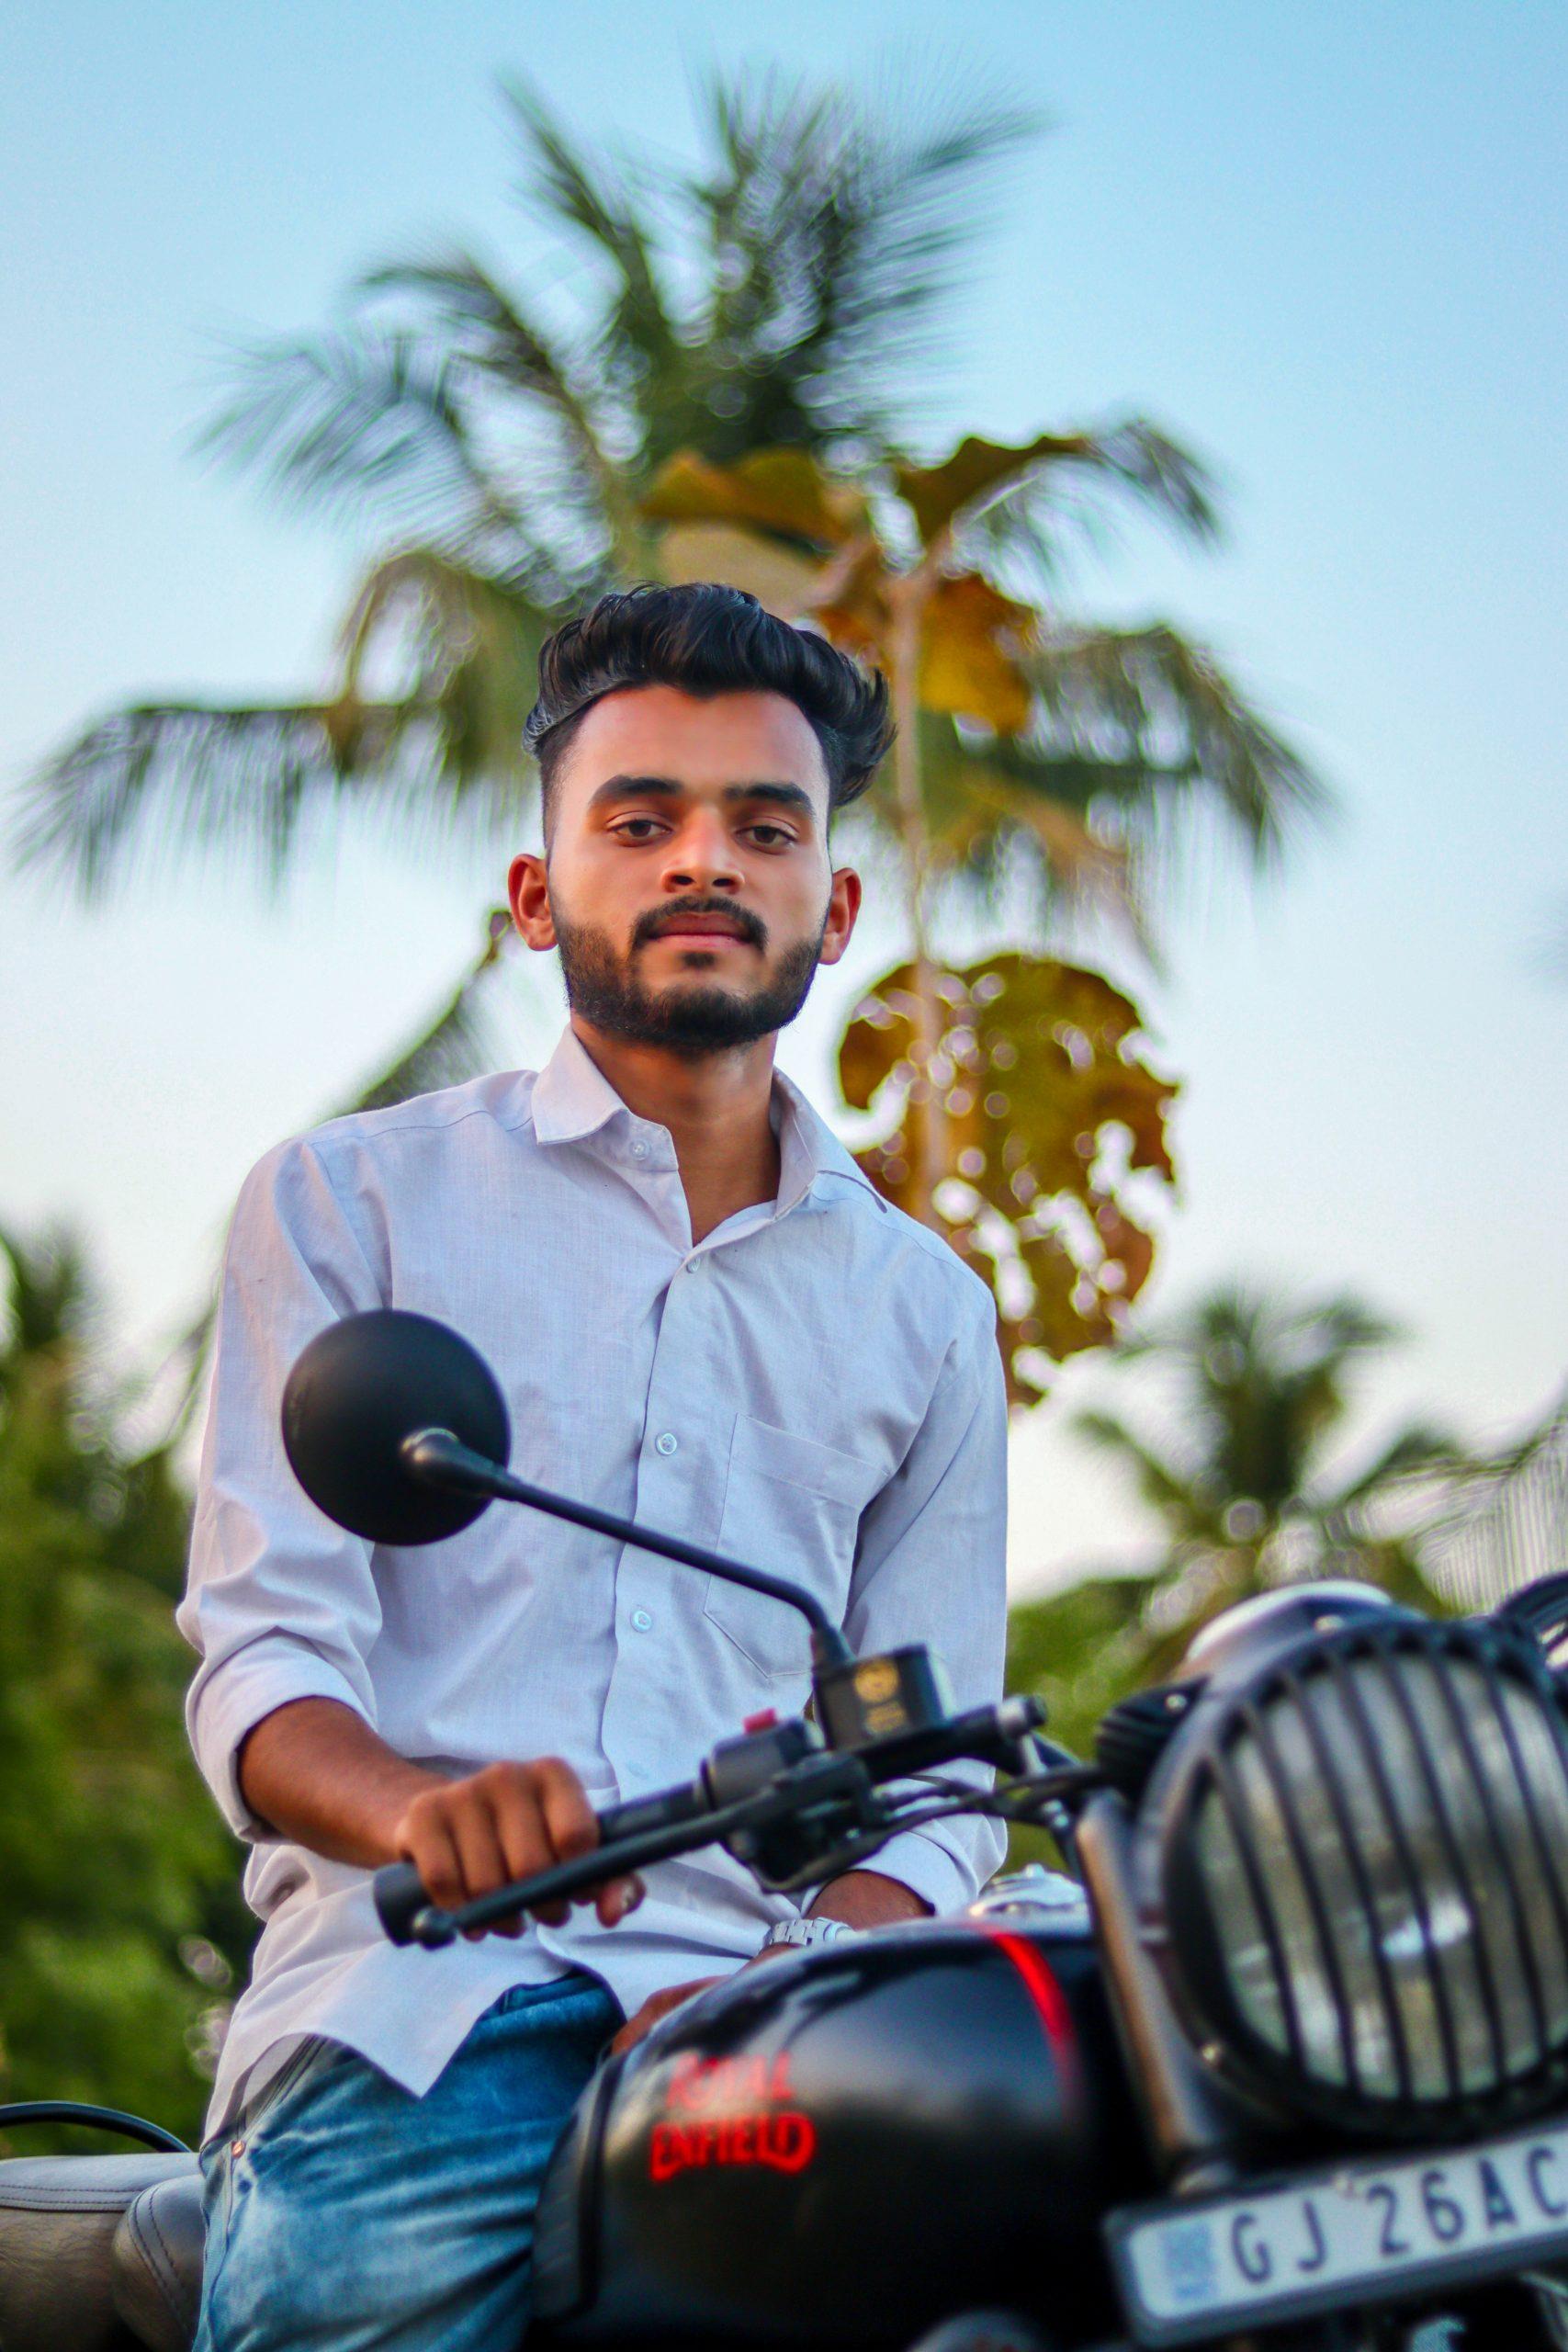 Boy posing on the bike